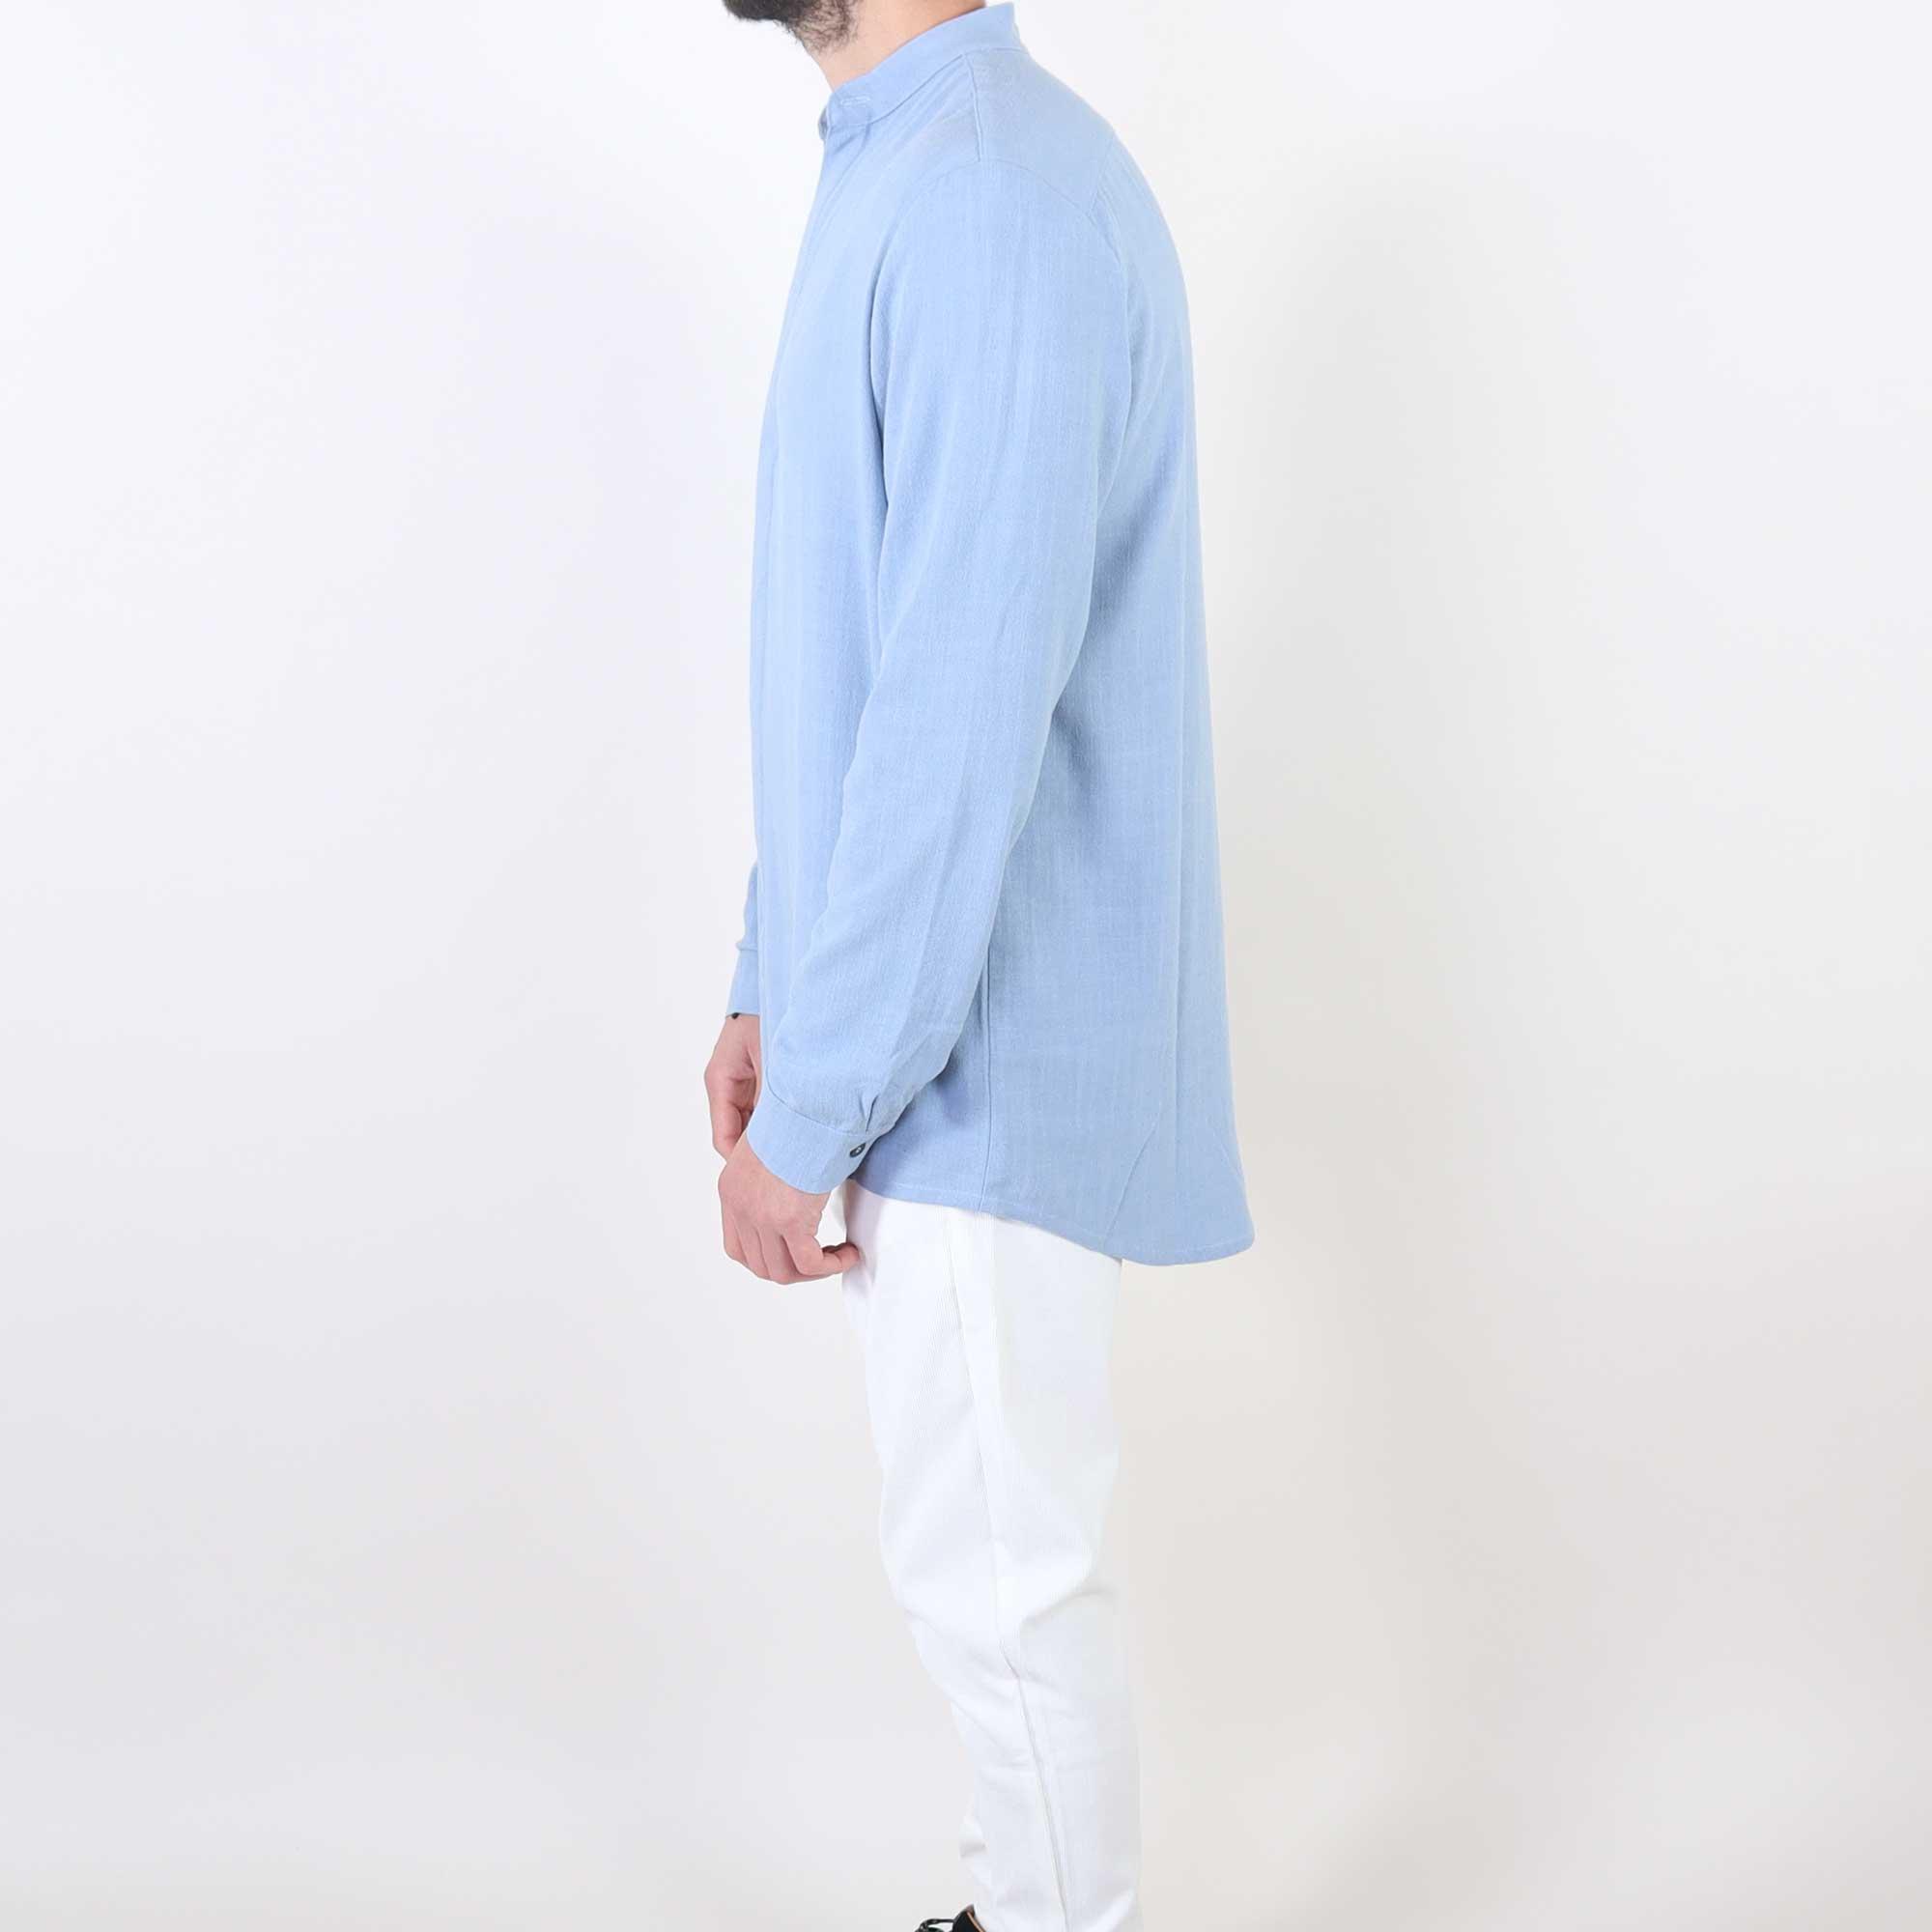 zippy-blauw-2